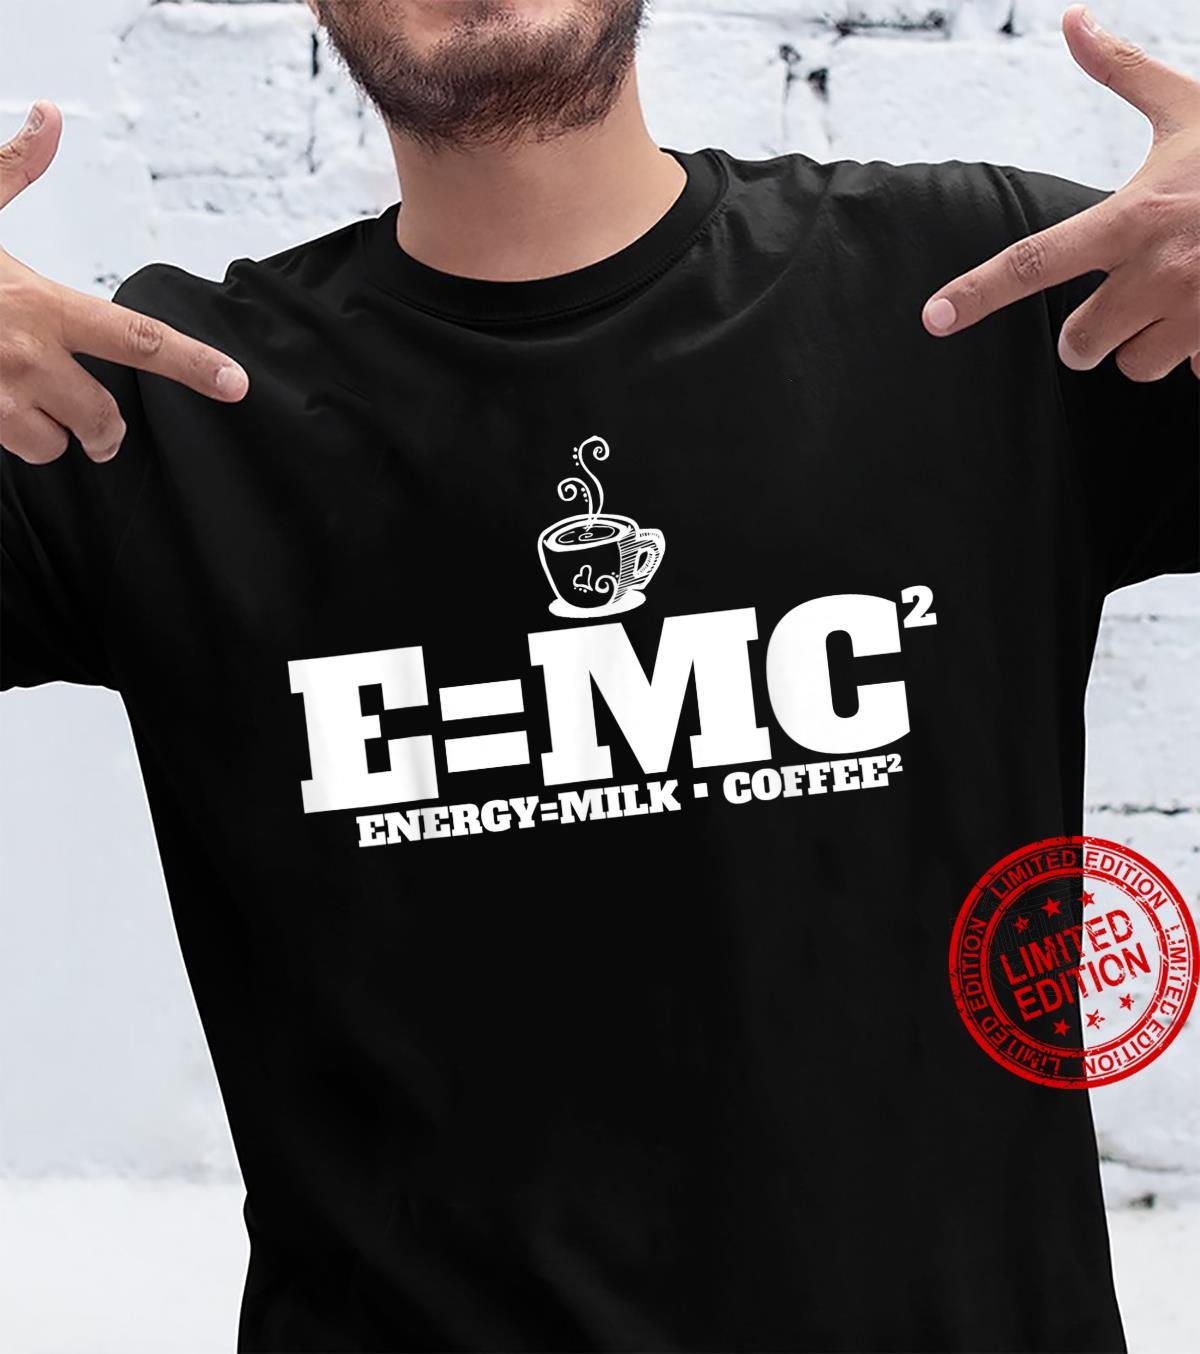 Kaffee Milchkaffee Kaffeetrinker Frühaufsteher Koffein Shirt